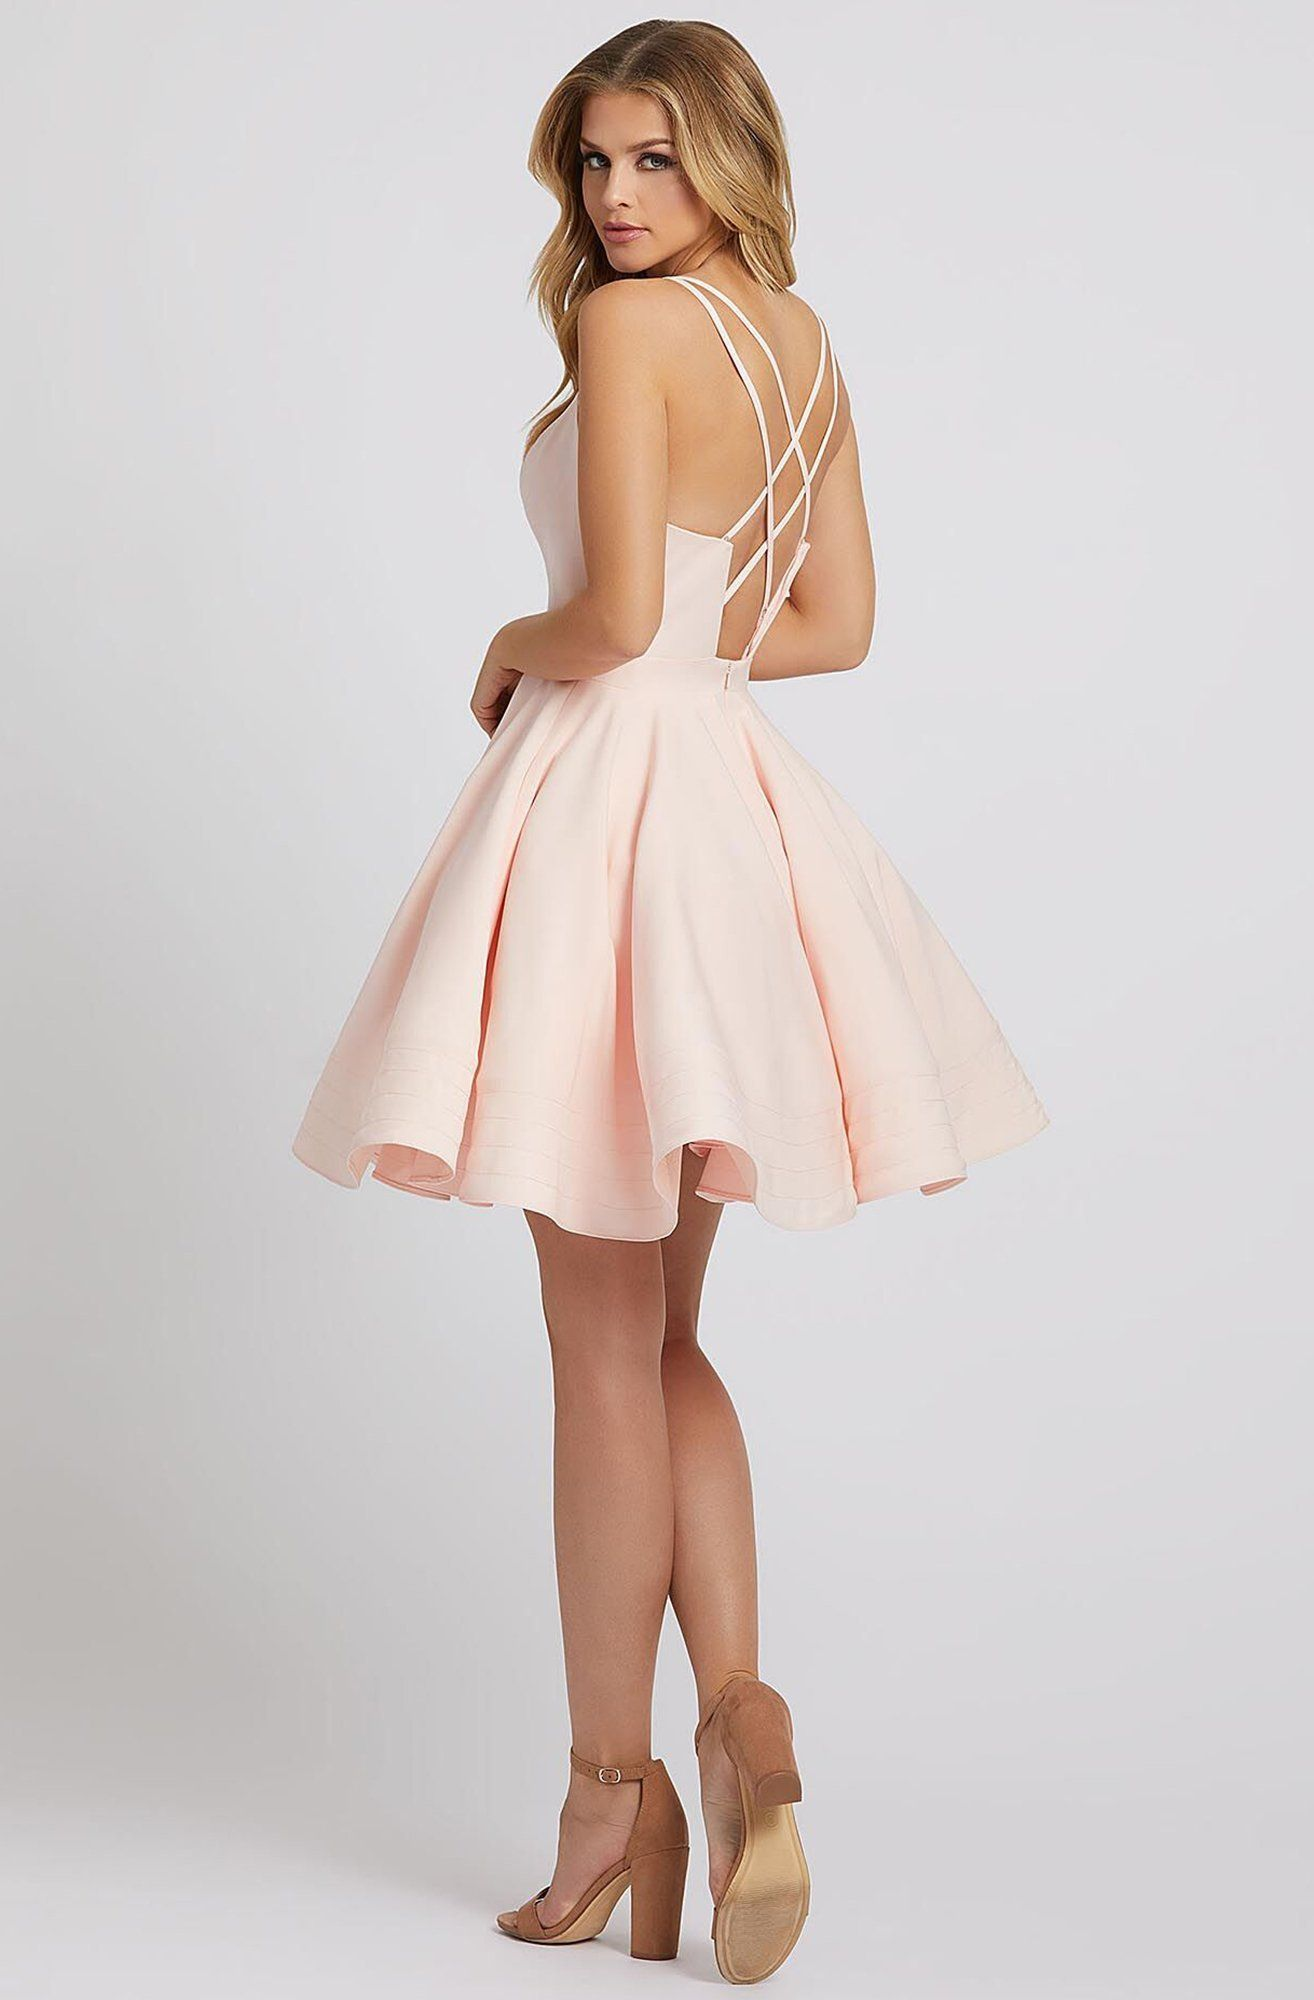 Ieena Duggal - 48948I Cutout Strapped V Neck A-Line Cocktail Dress #backlesscocktaildress